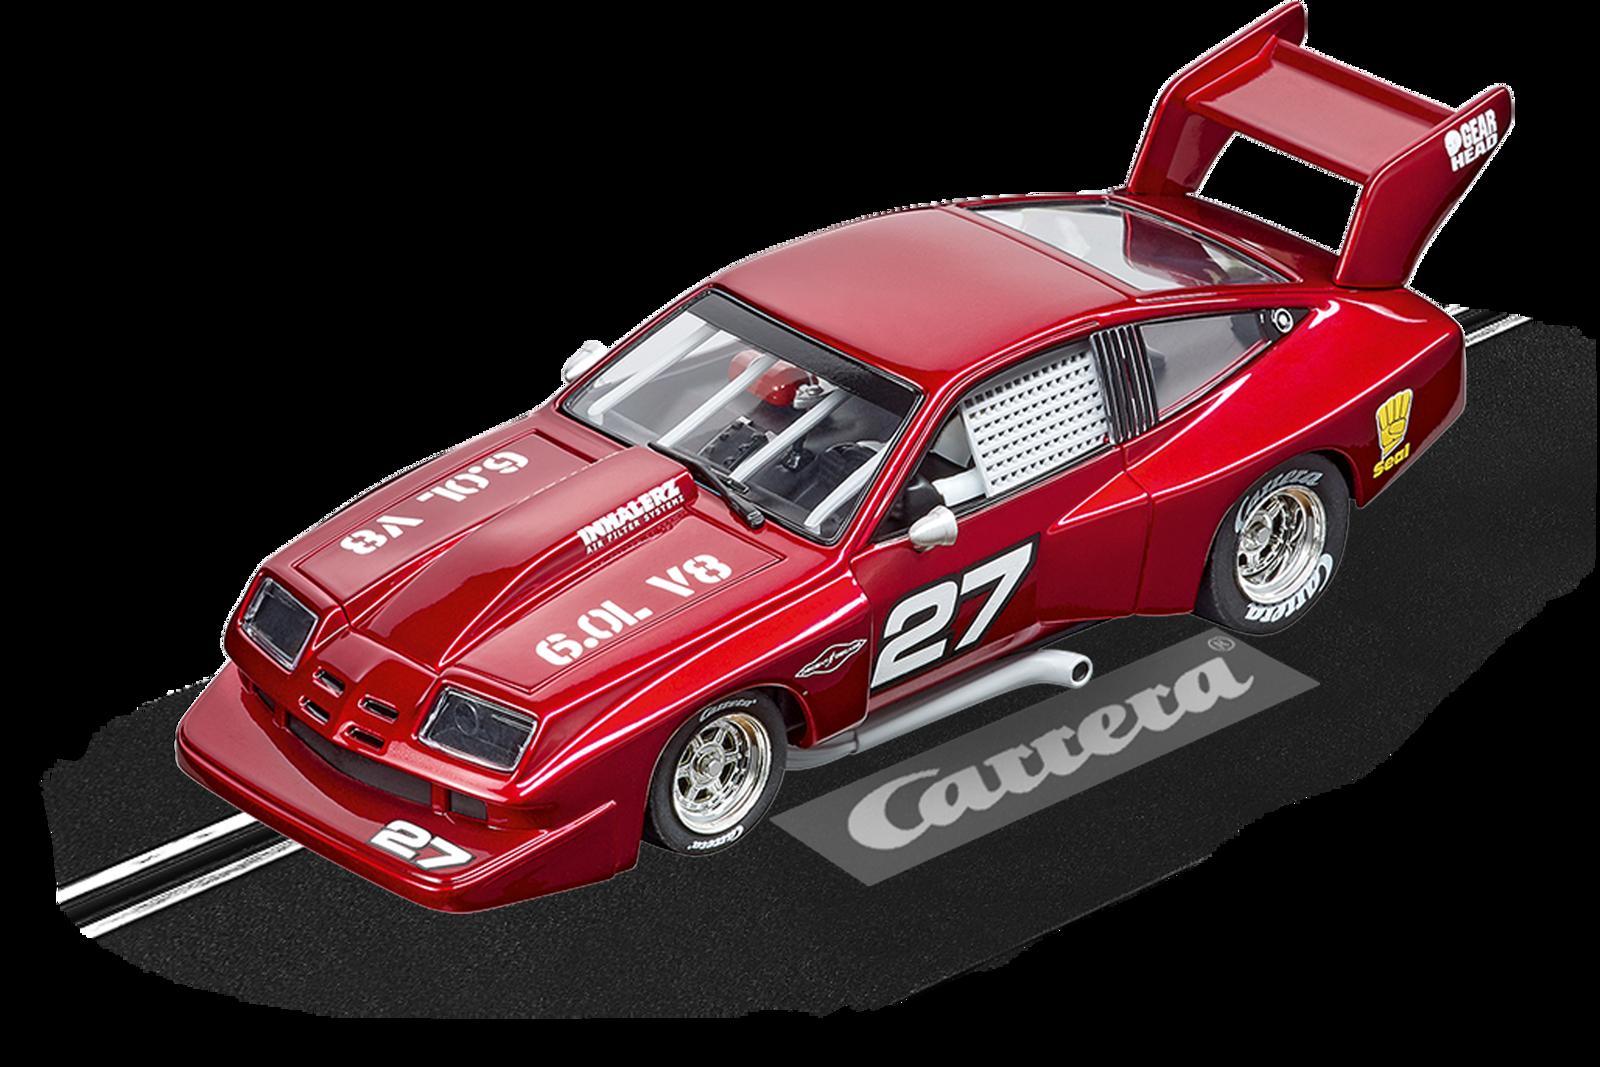 Chevrolet Dekon Monza #27 (30905)